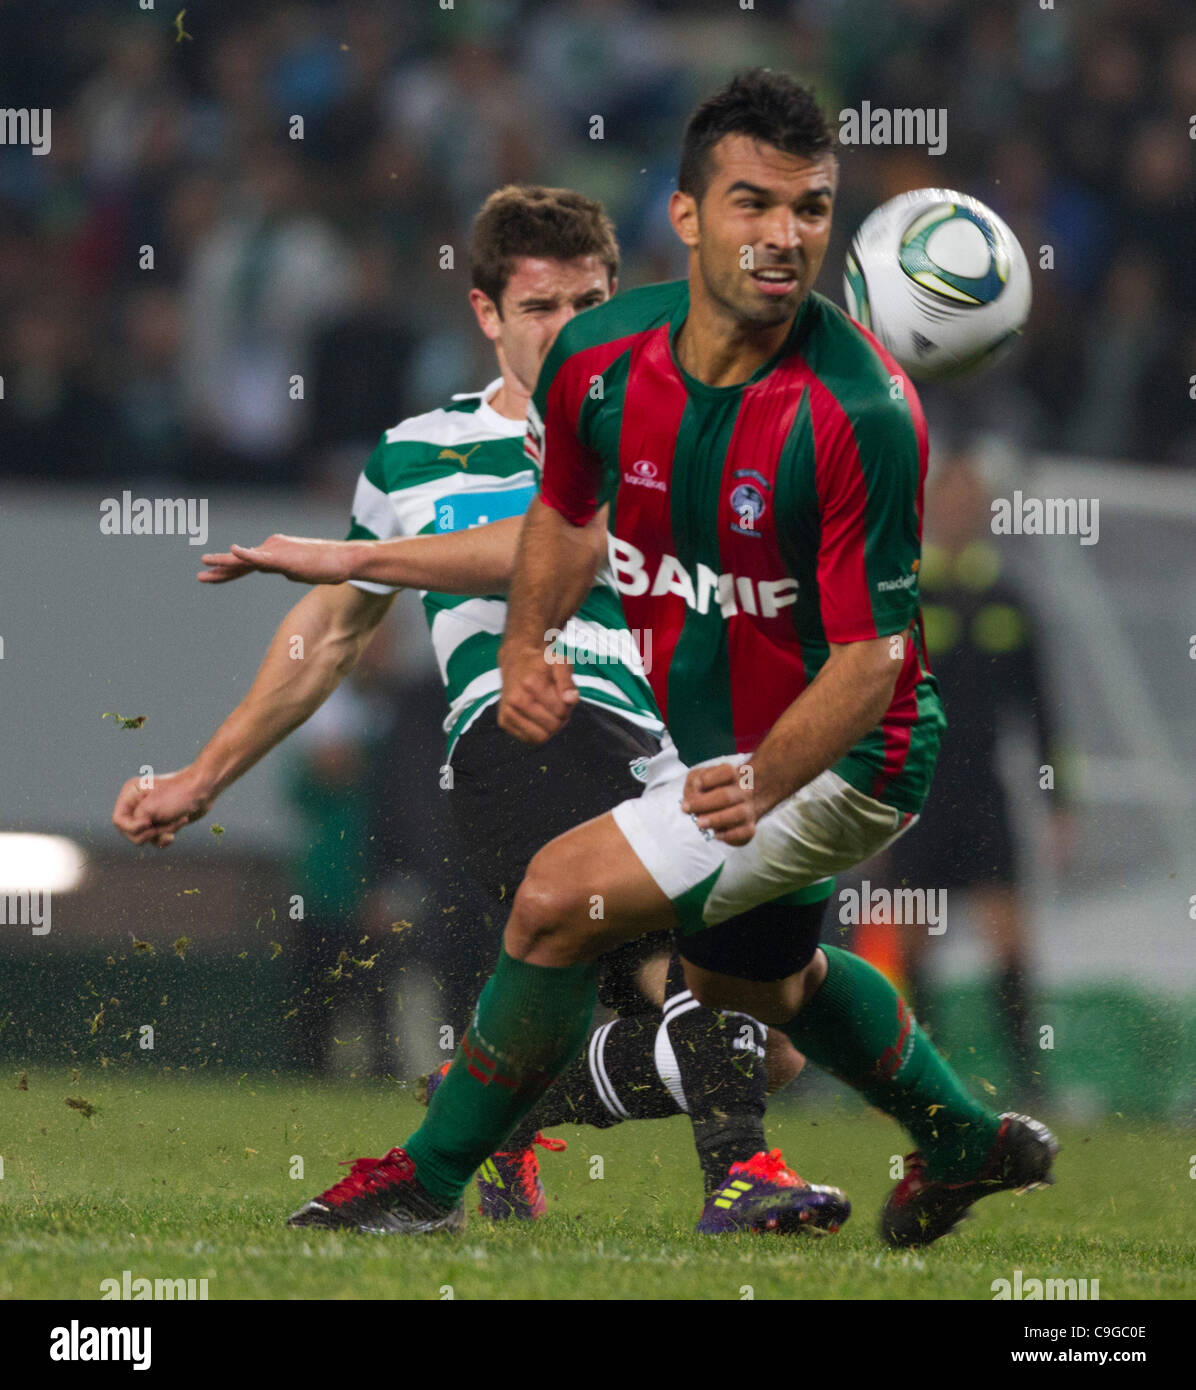 Portugal Cup Quarter final - Sporting CP (SCP) x SC Maritimo (SCM)  Roberto Sousa CS Maritimo Midfielder looking Stock Photo